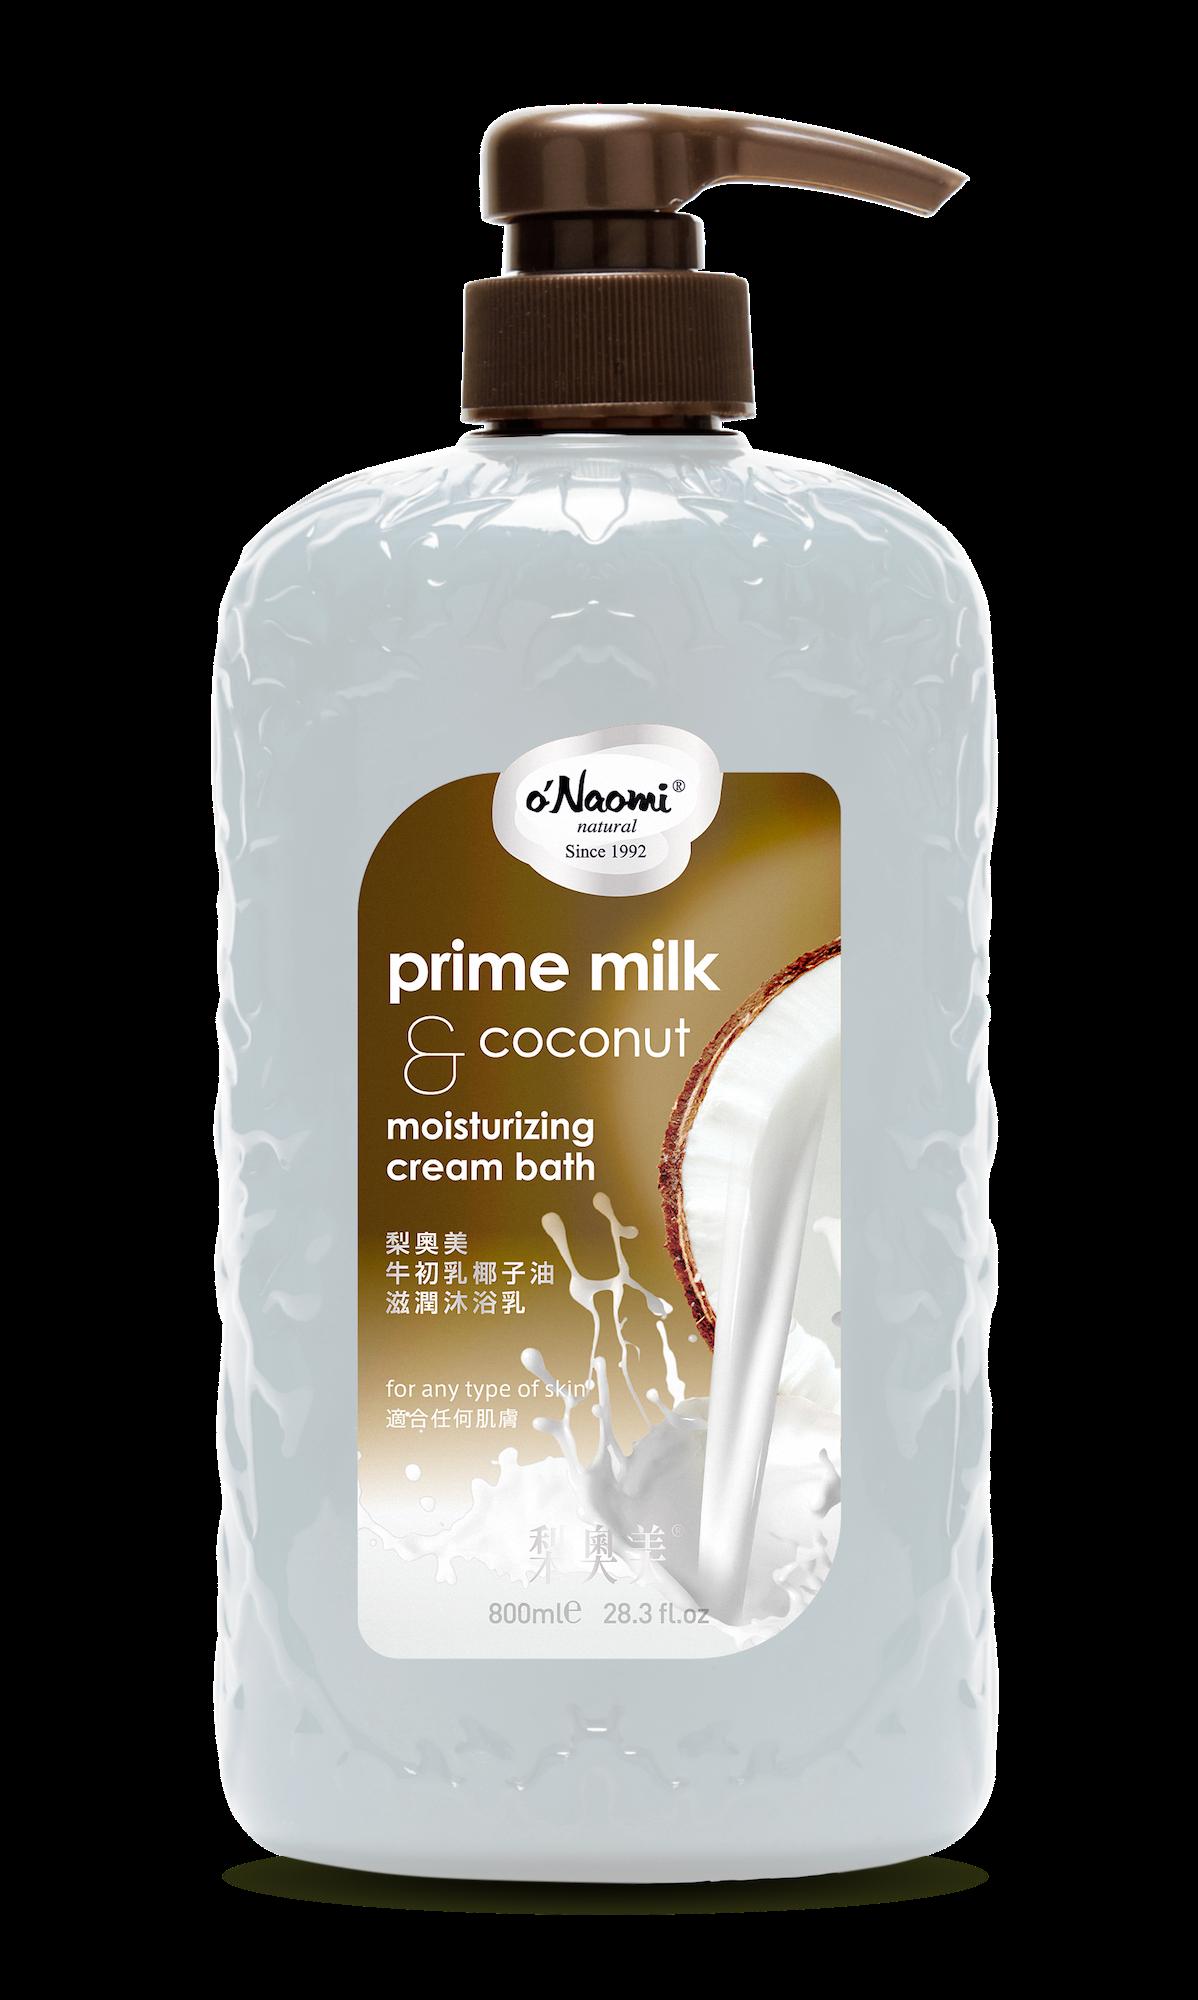 Onaomi Prime Milk Coconut Bath Mockup